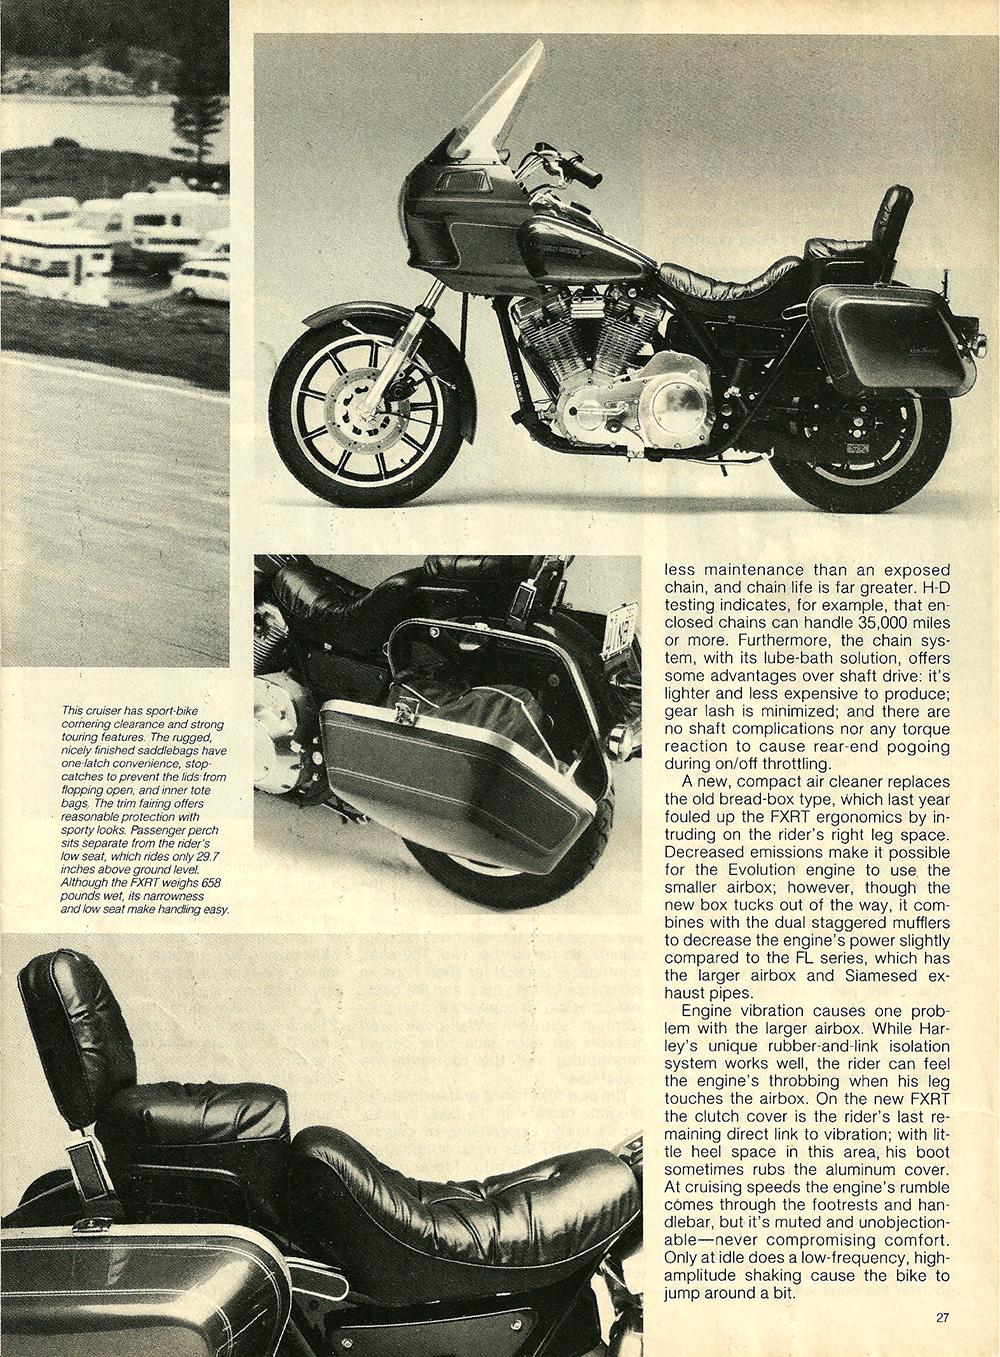 1983 Harley Davidson FXRT Sport Glide road test 4.jpg